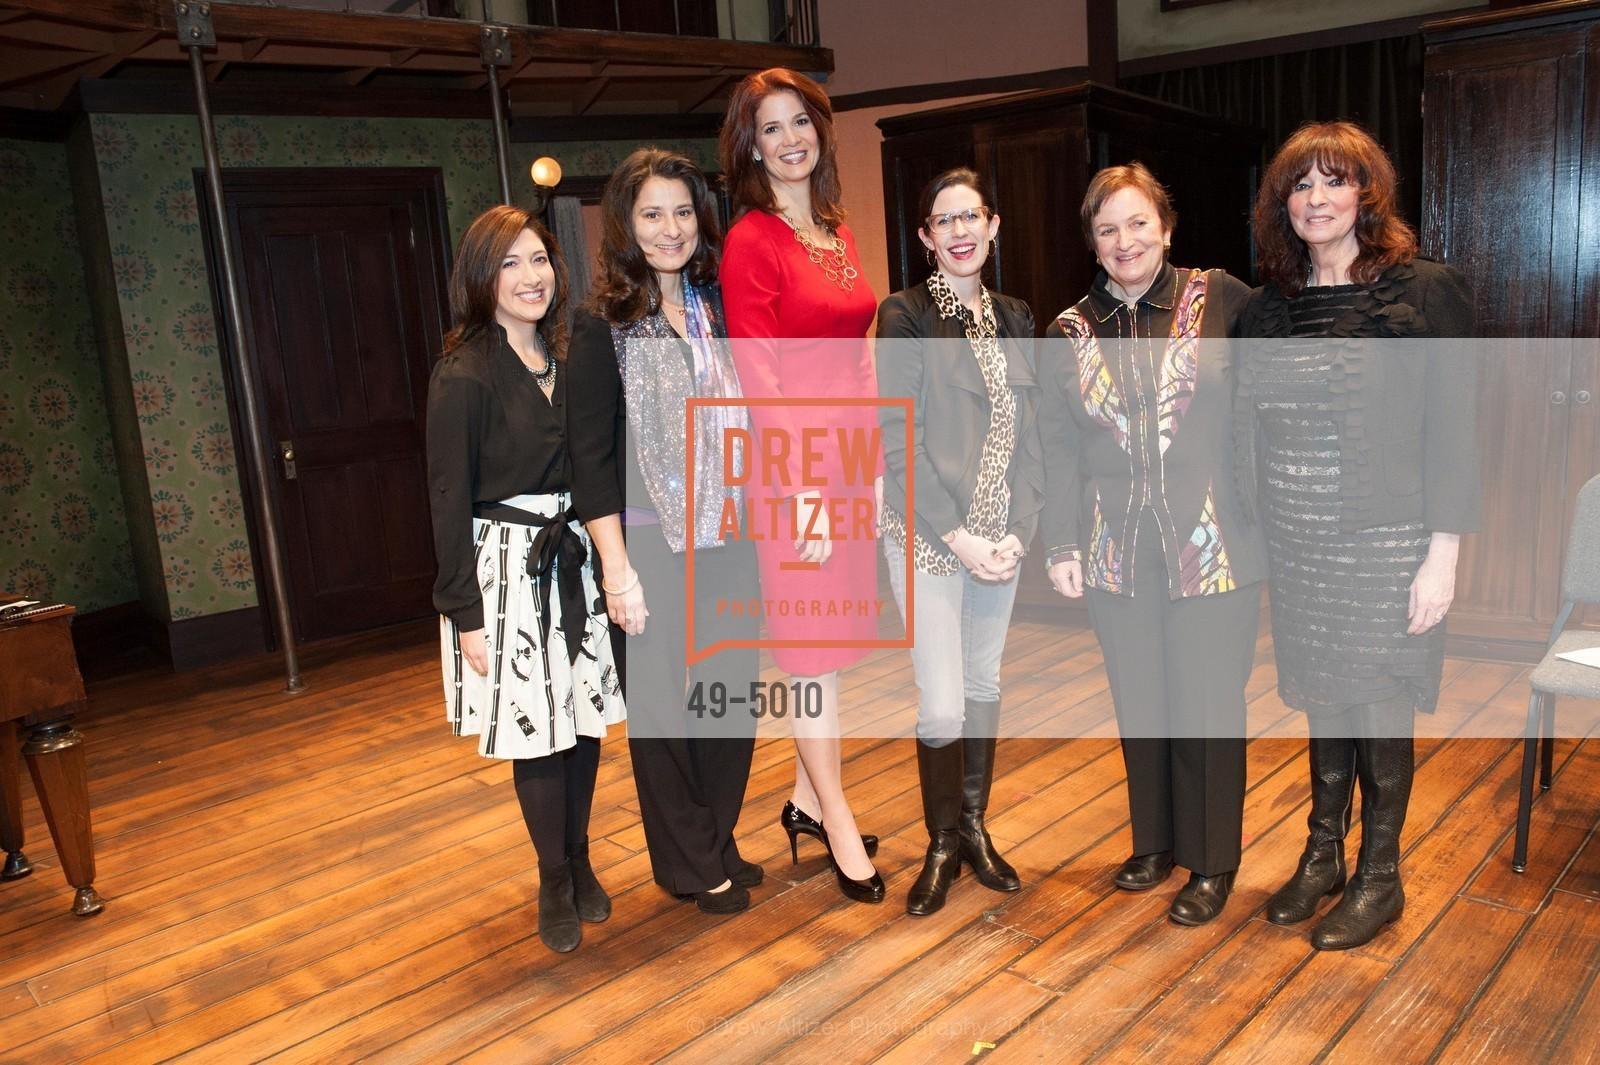 Randi Zuckerberg, Natalie Batalha, Jenny Dearborn, Lauren Gunderson, Ann Bowers, Jodye Friedman, Photo #49-5010